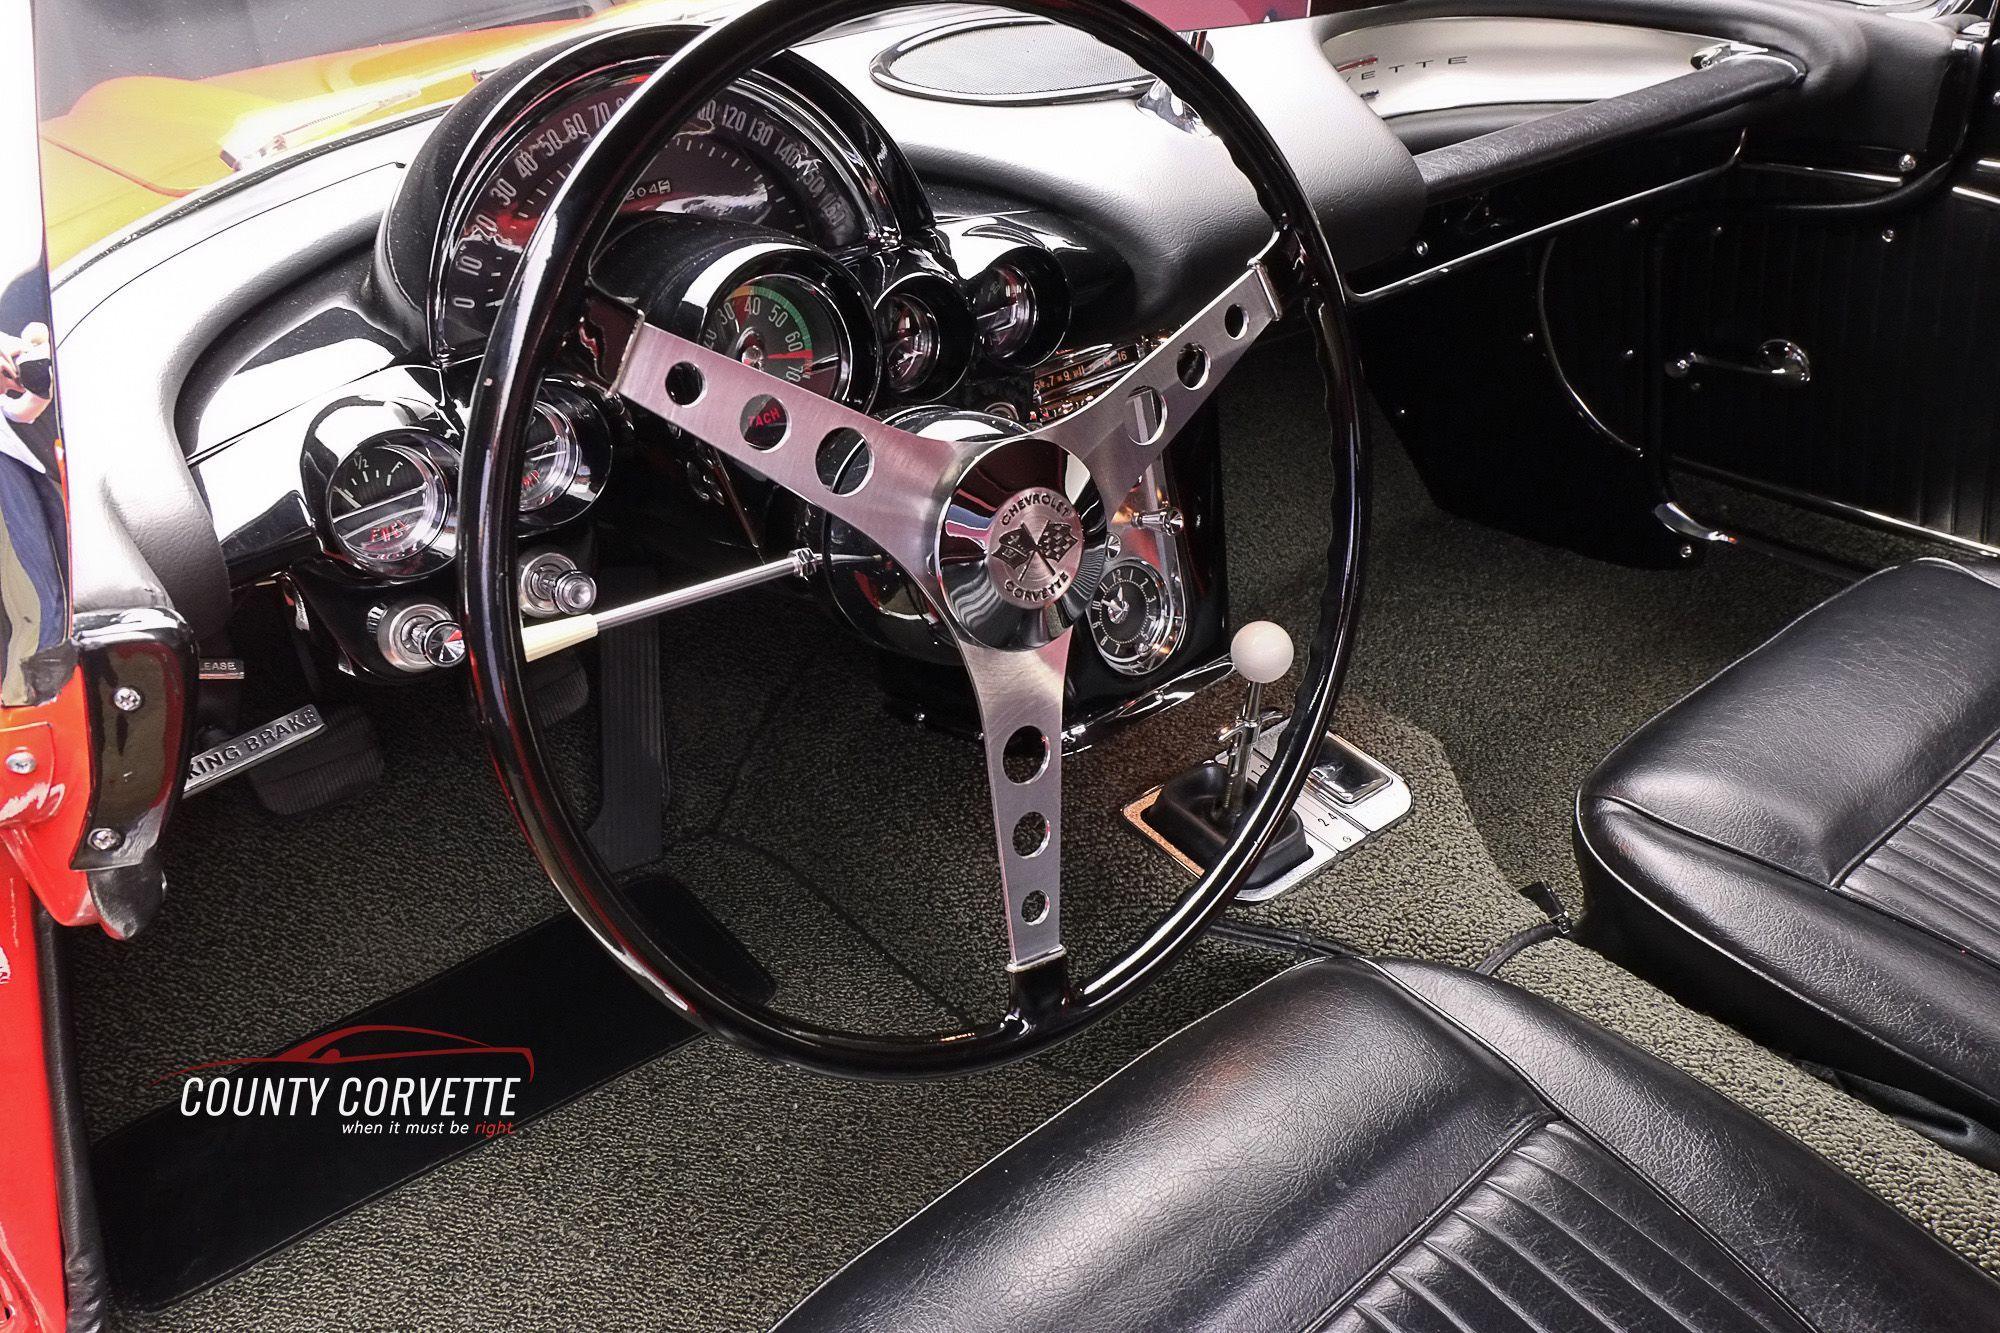 1962 corvette convertible restoration picture heavy corvetteforum chevrolet corvette forum discussion